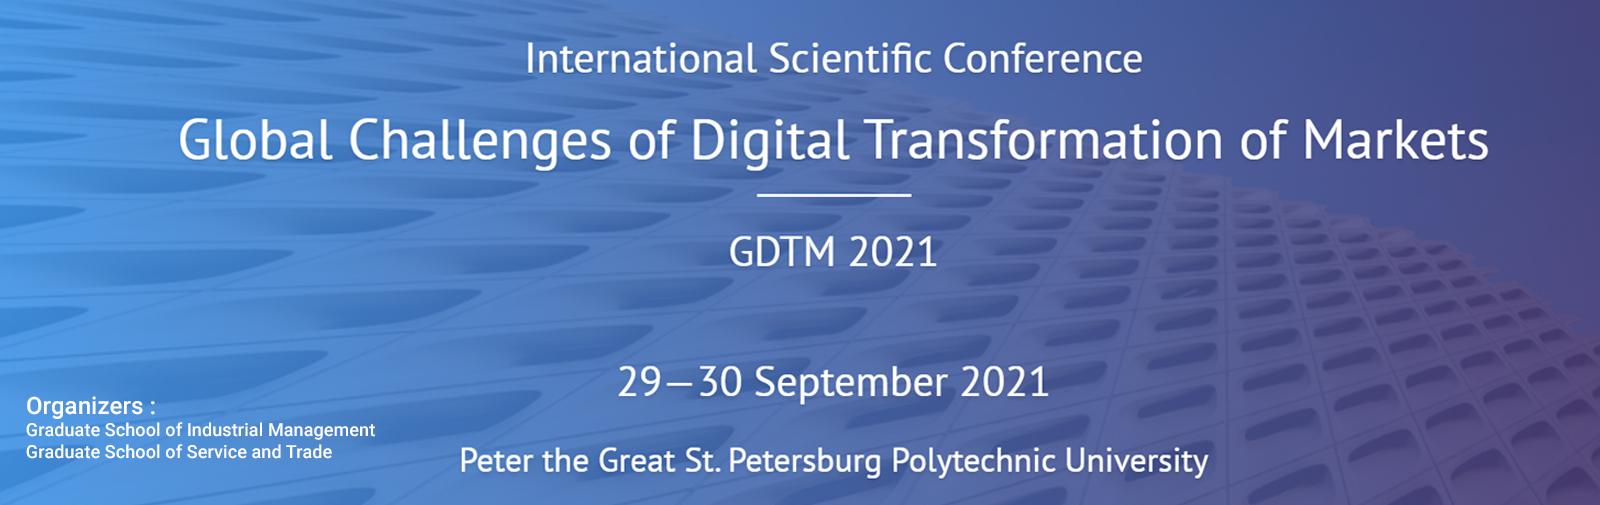 GDTM 2021